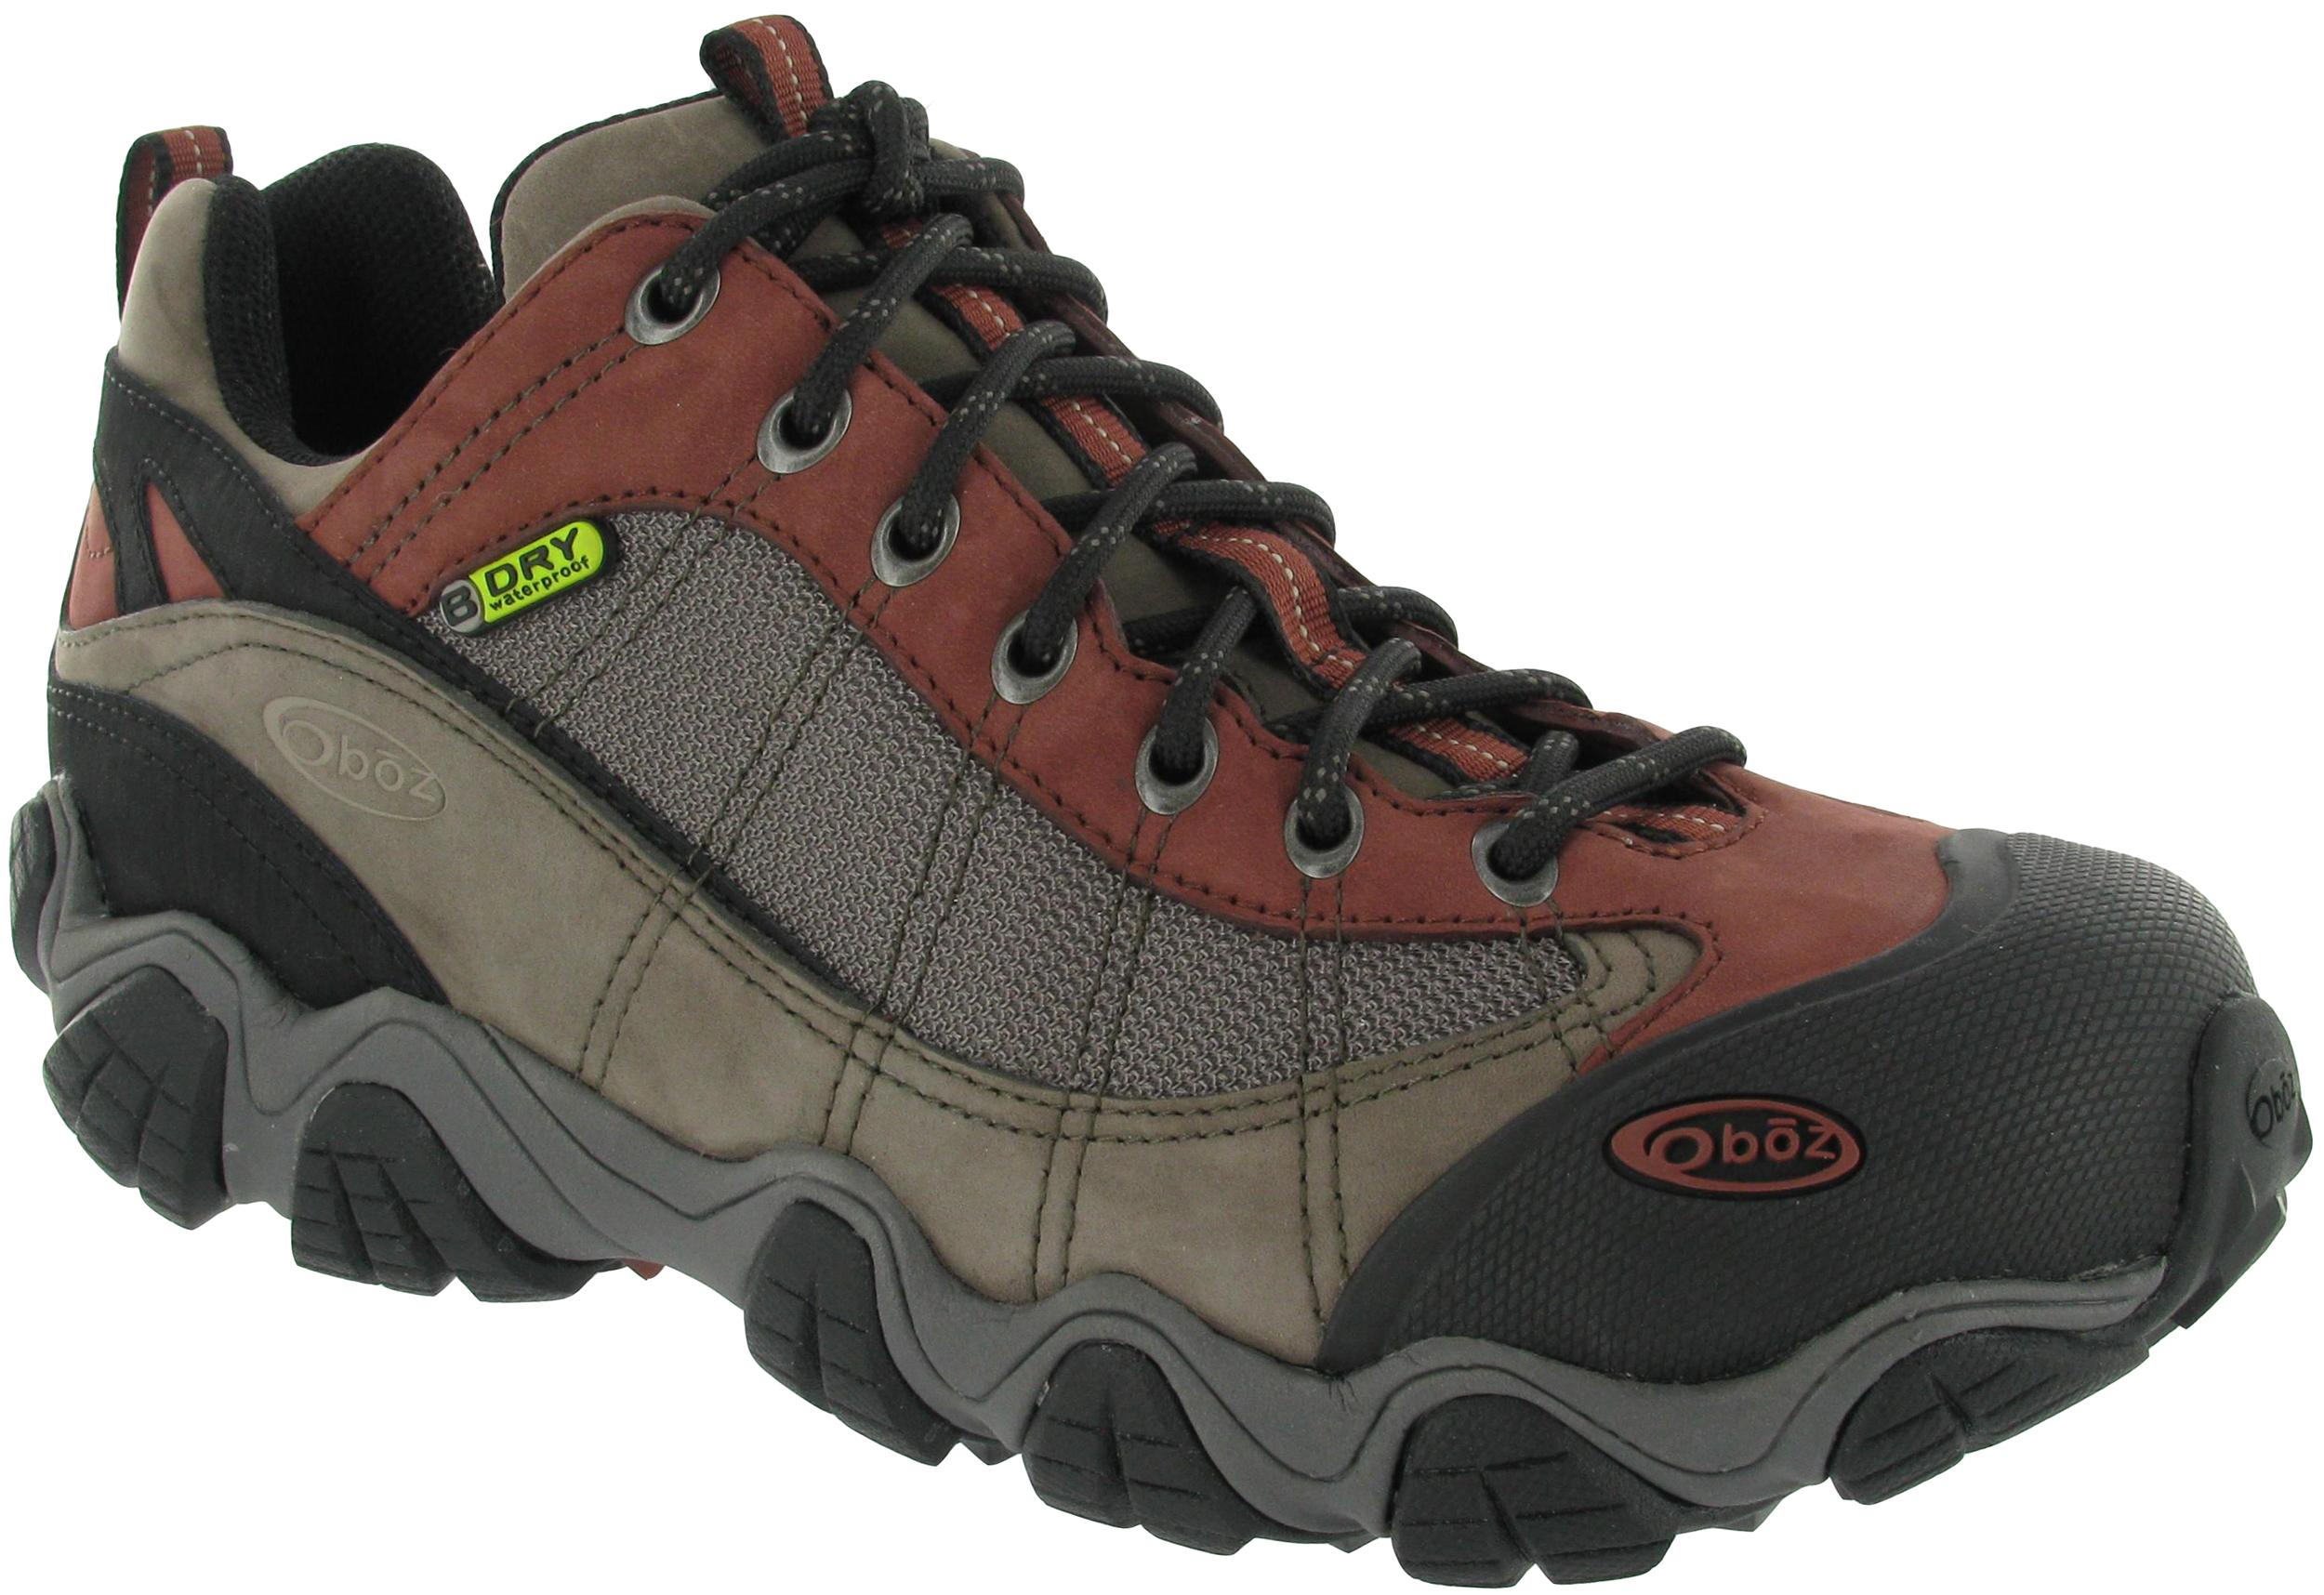 f079aa59a10 Oboz Firebrand II Hiking Shoes - Men's